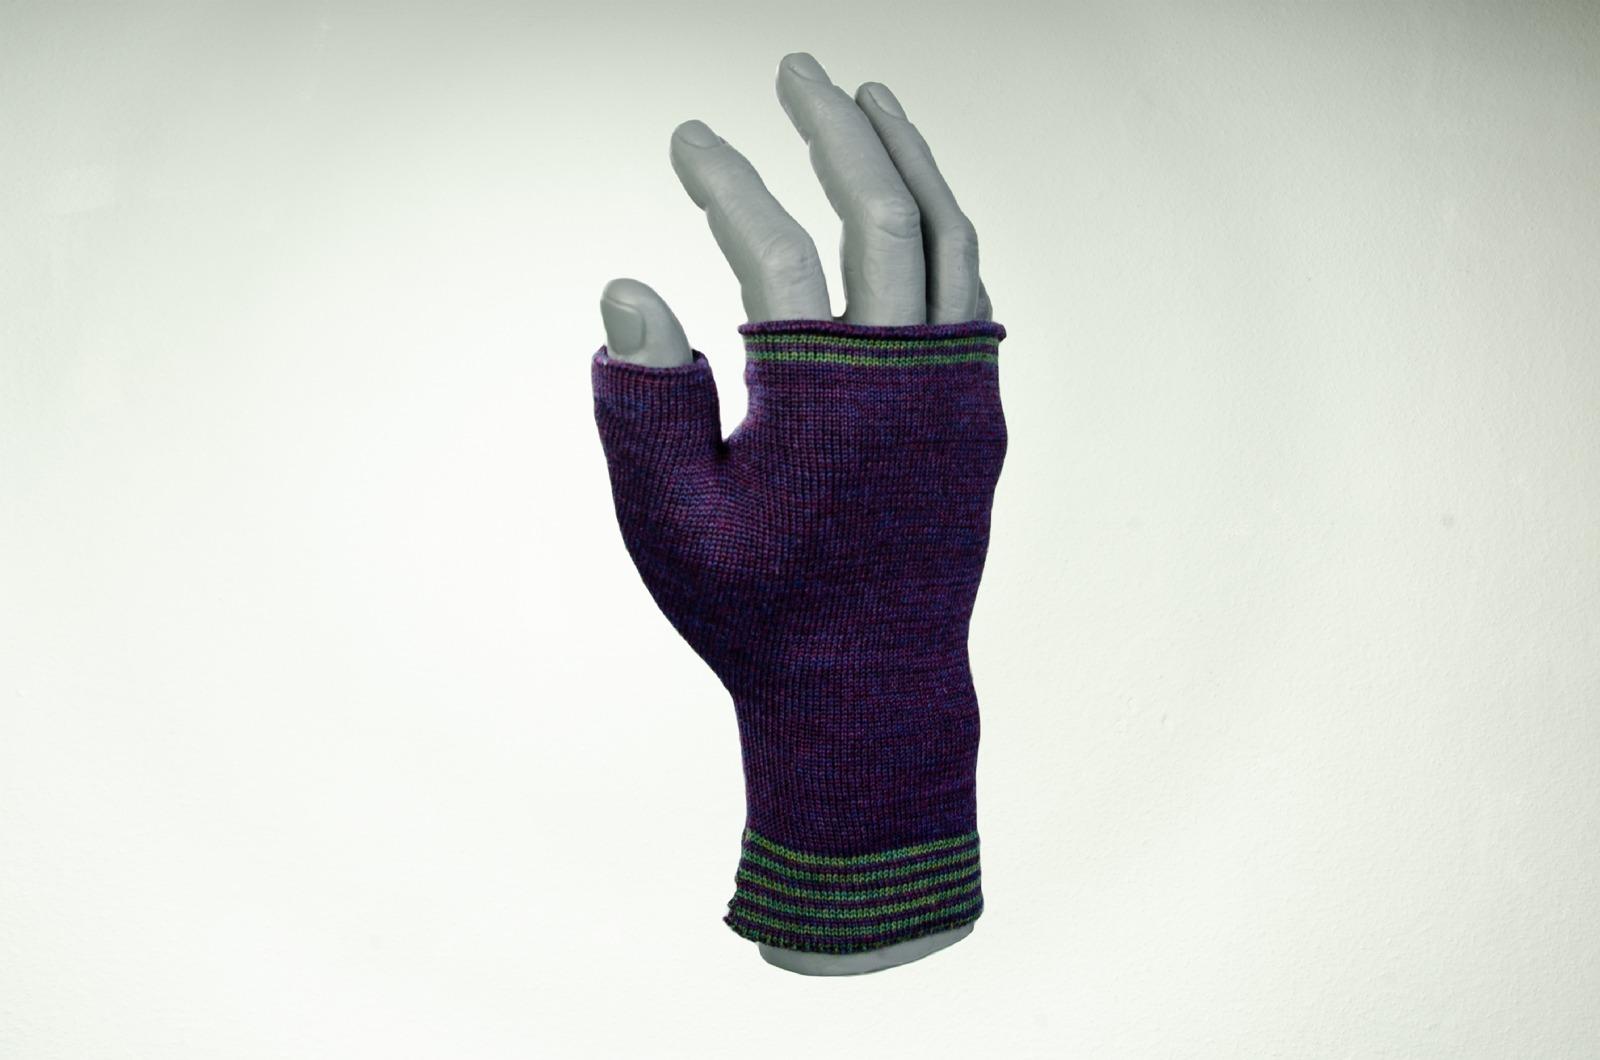 Merino Handwärmer Herren in lila und